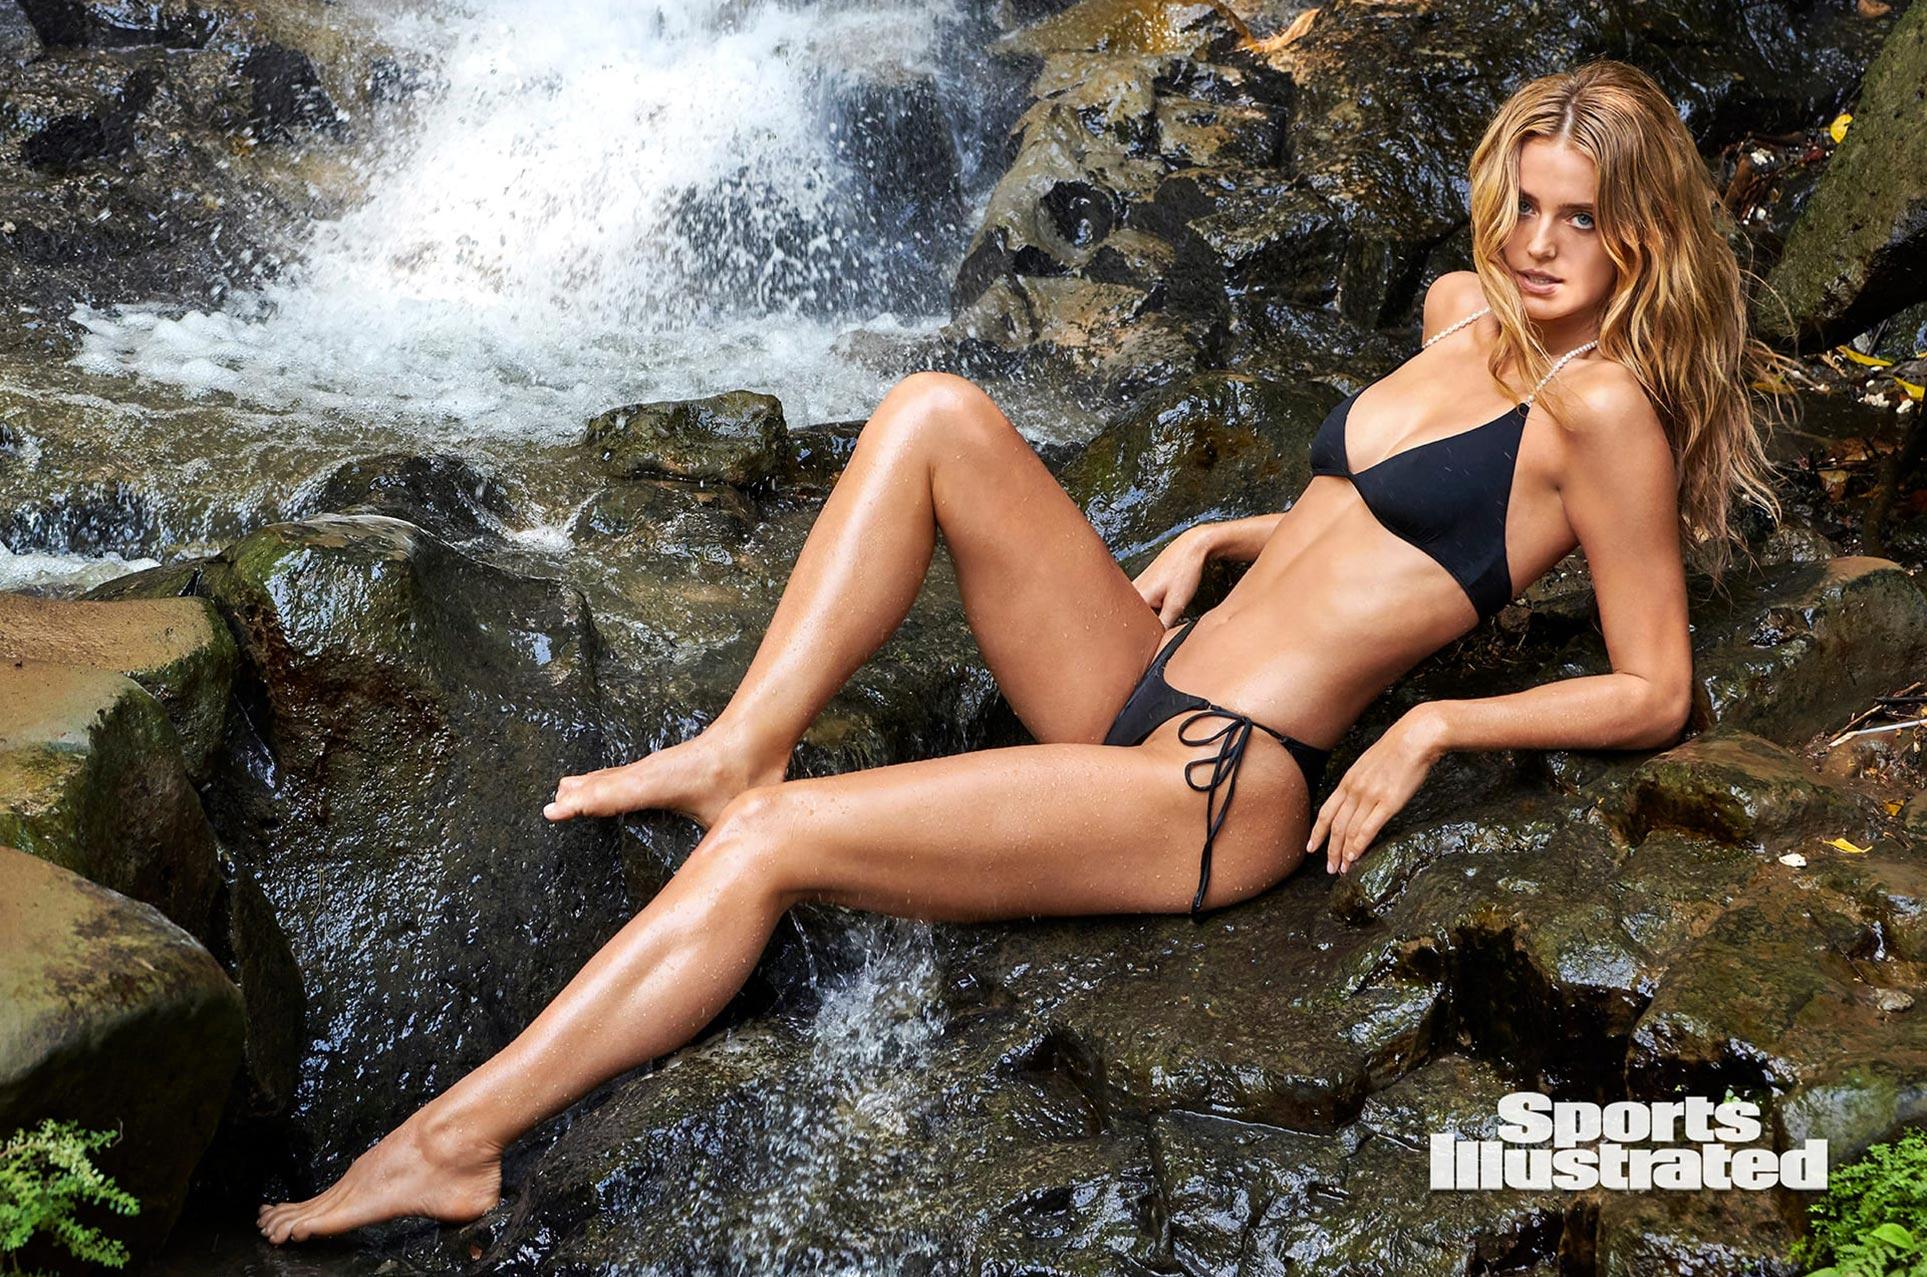 Кейт Бок в каталоге купальников Sports Illustrated Swimsuit 2020 / фото 06